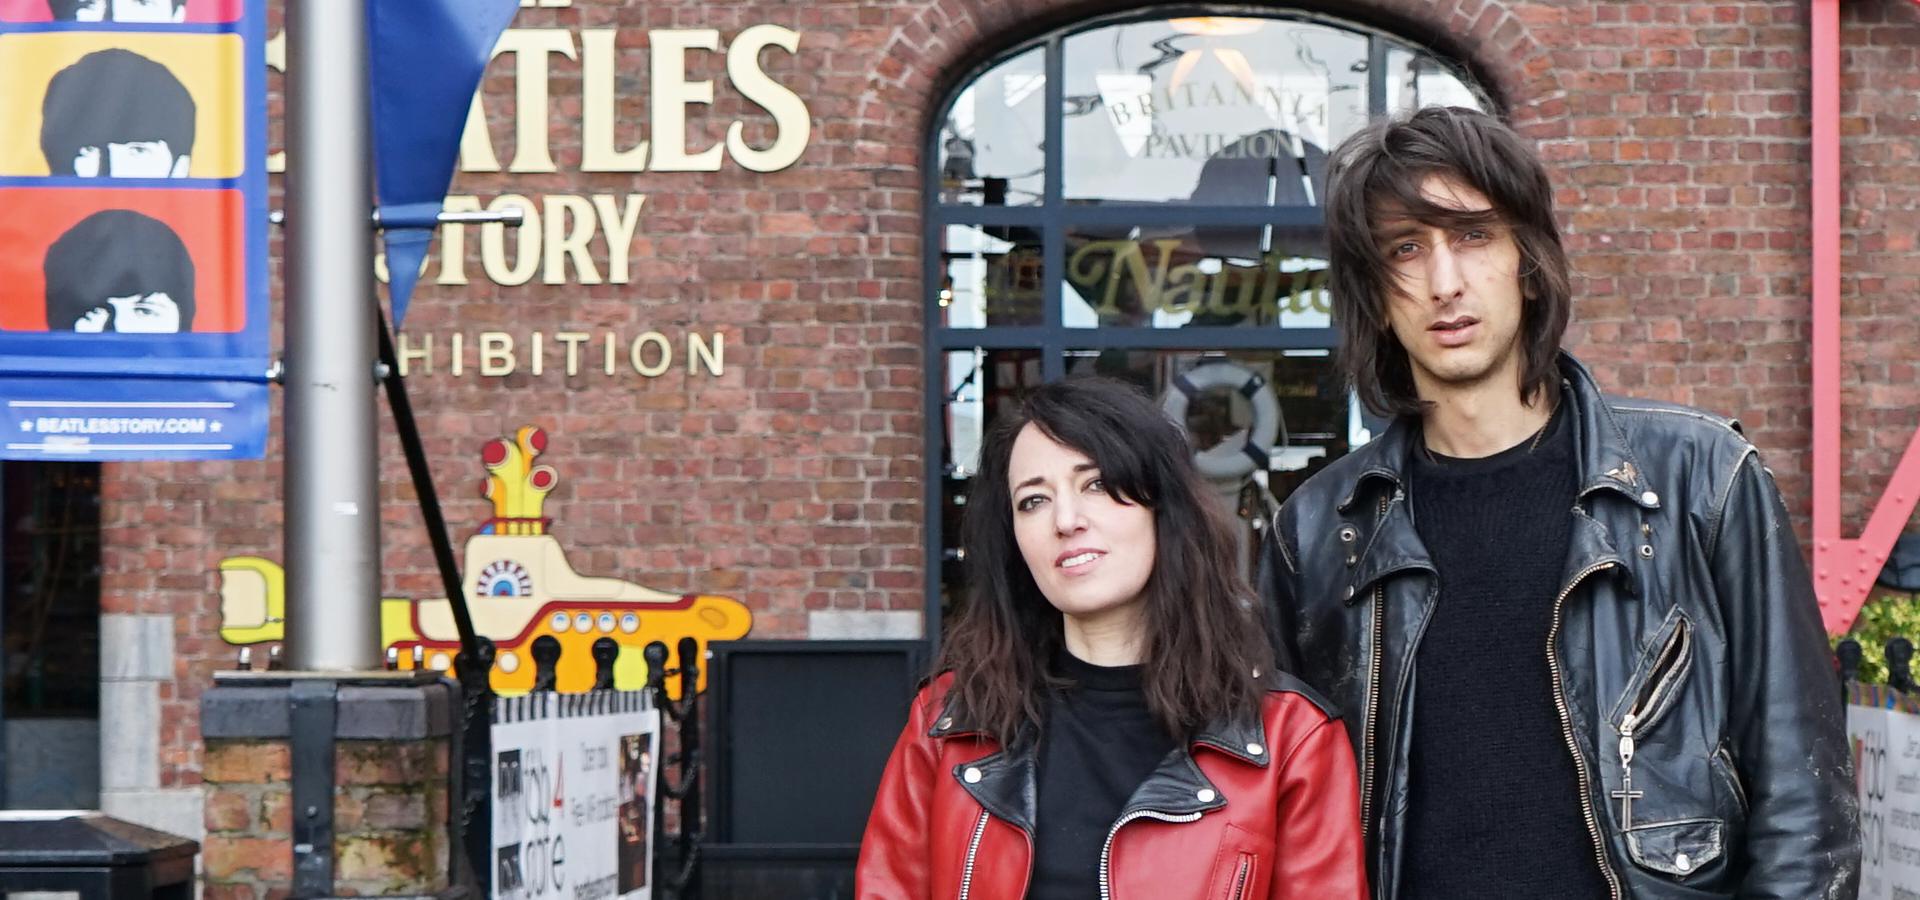 Cat's Eyes: Alt pop duo visit The Beatles Story